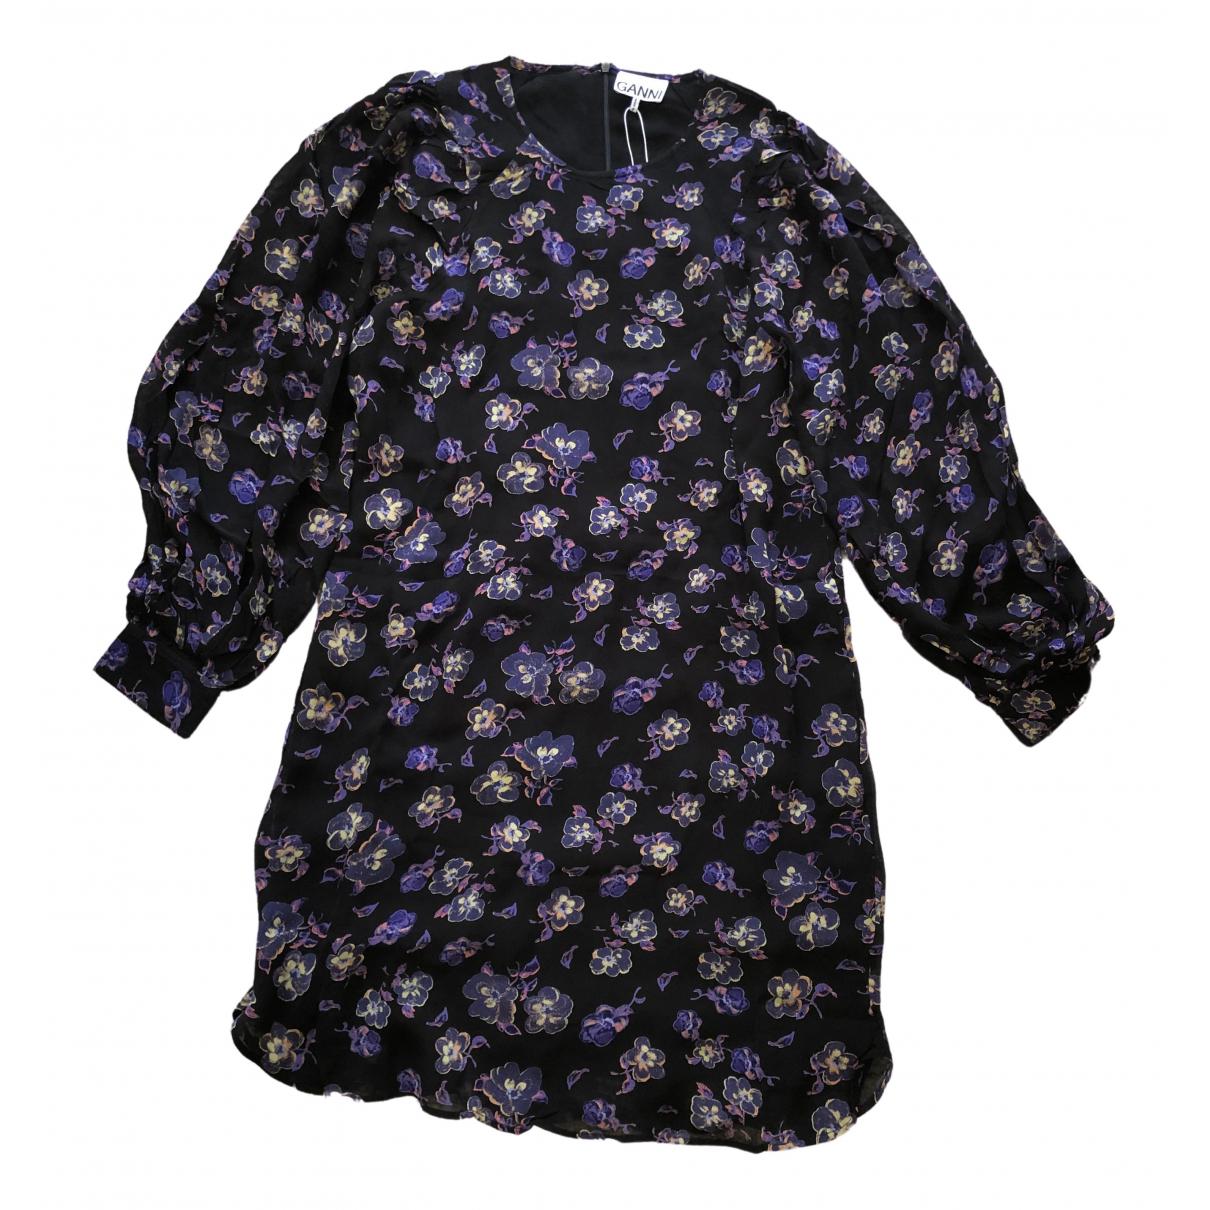 Ganni Fall Winter 2019 Multicolour dress for Women 40 FR